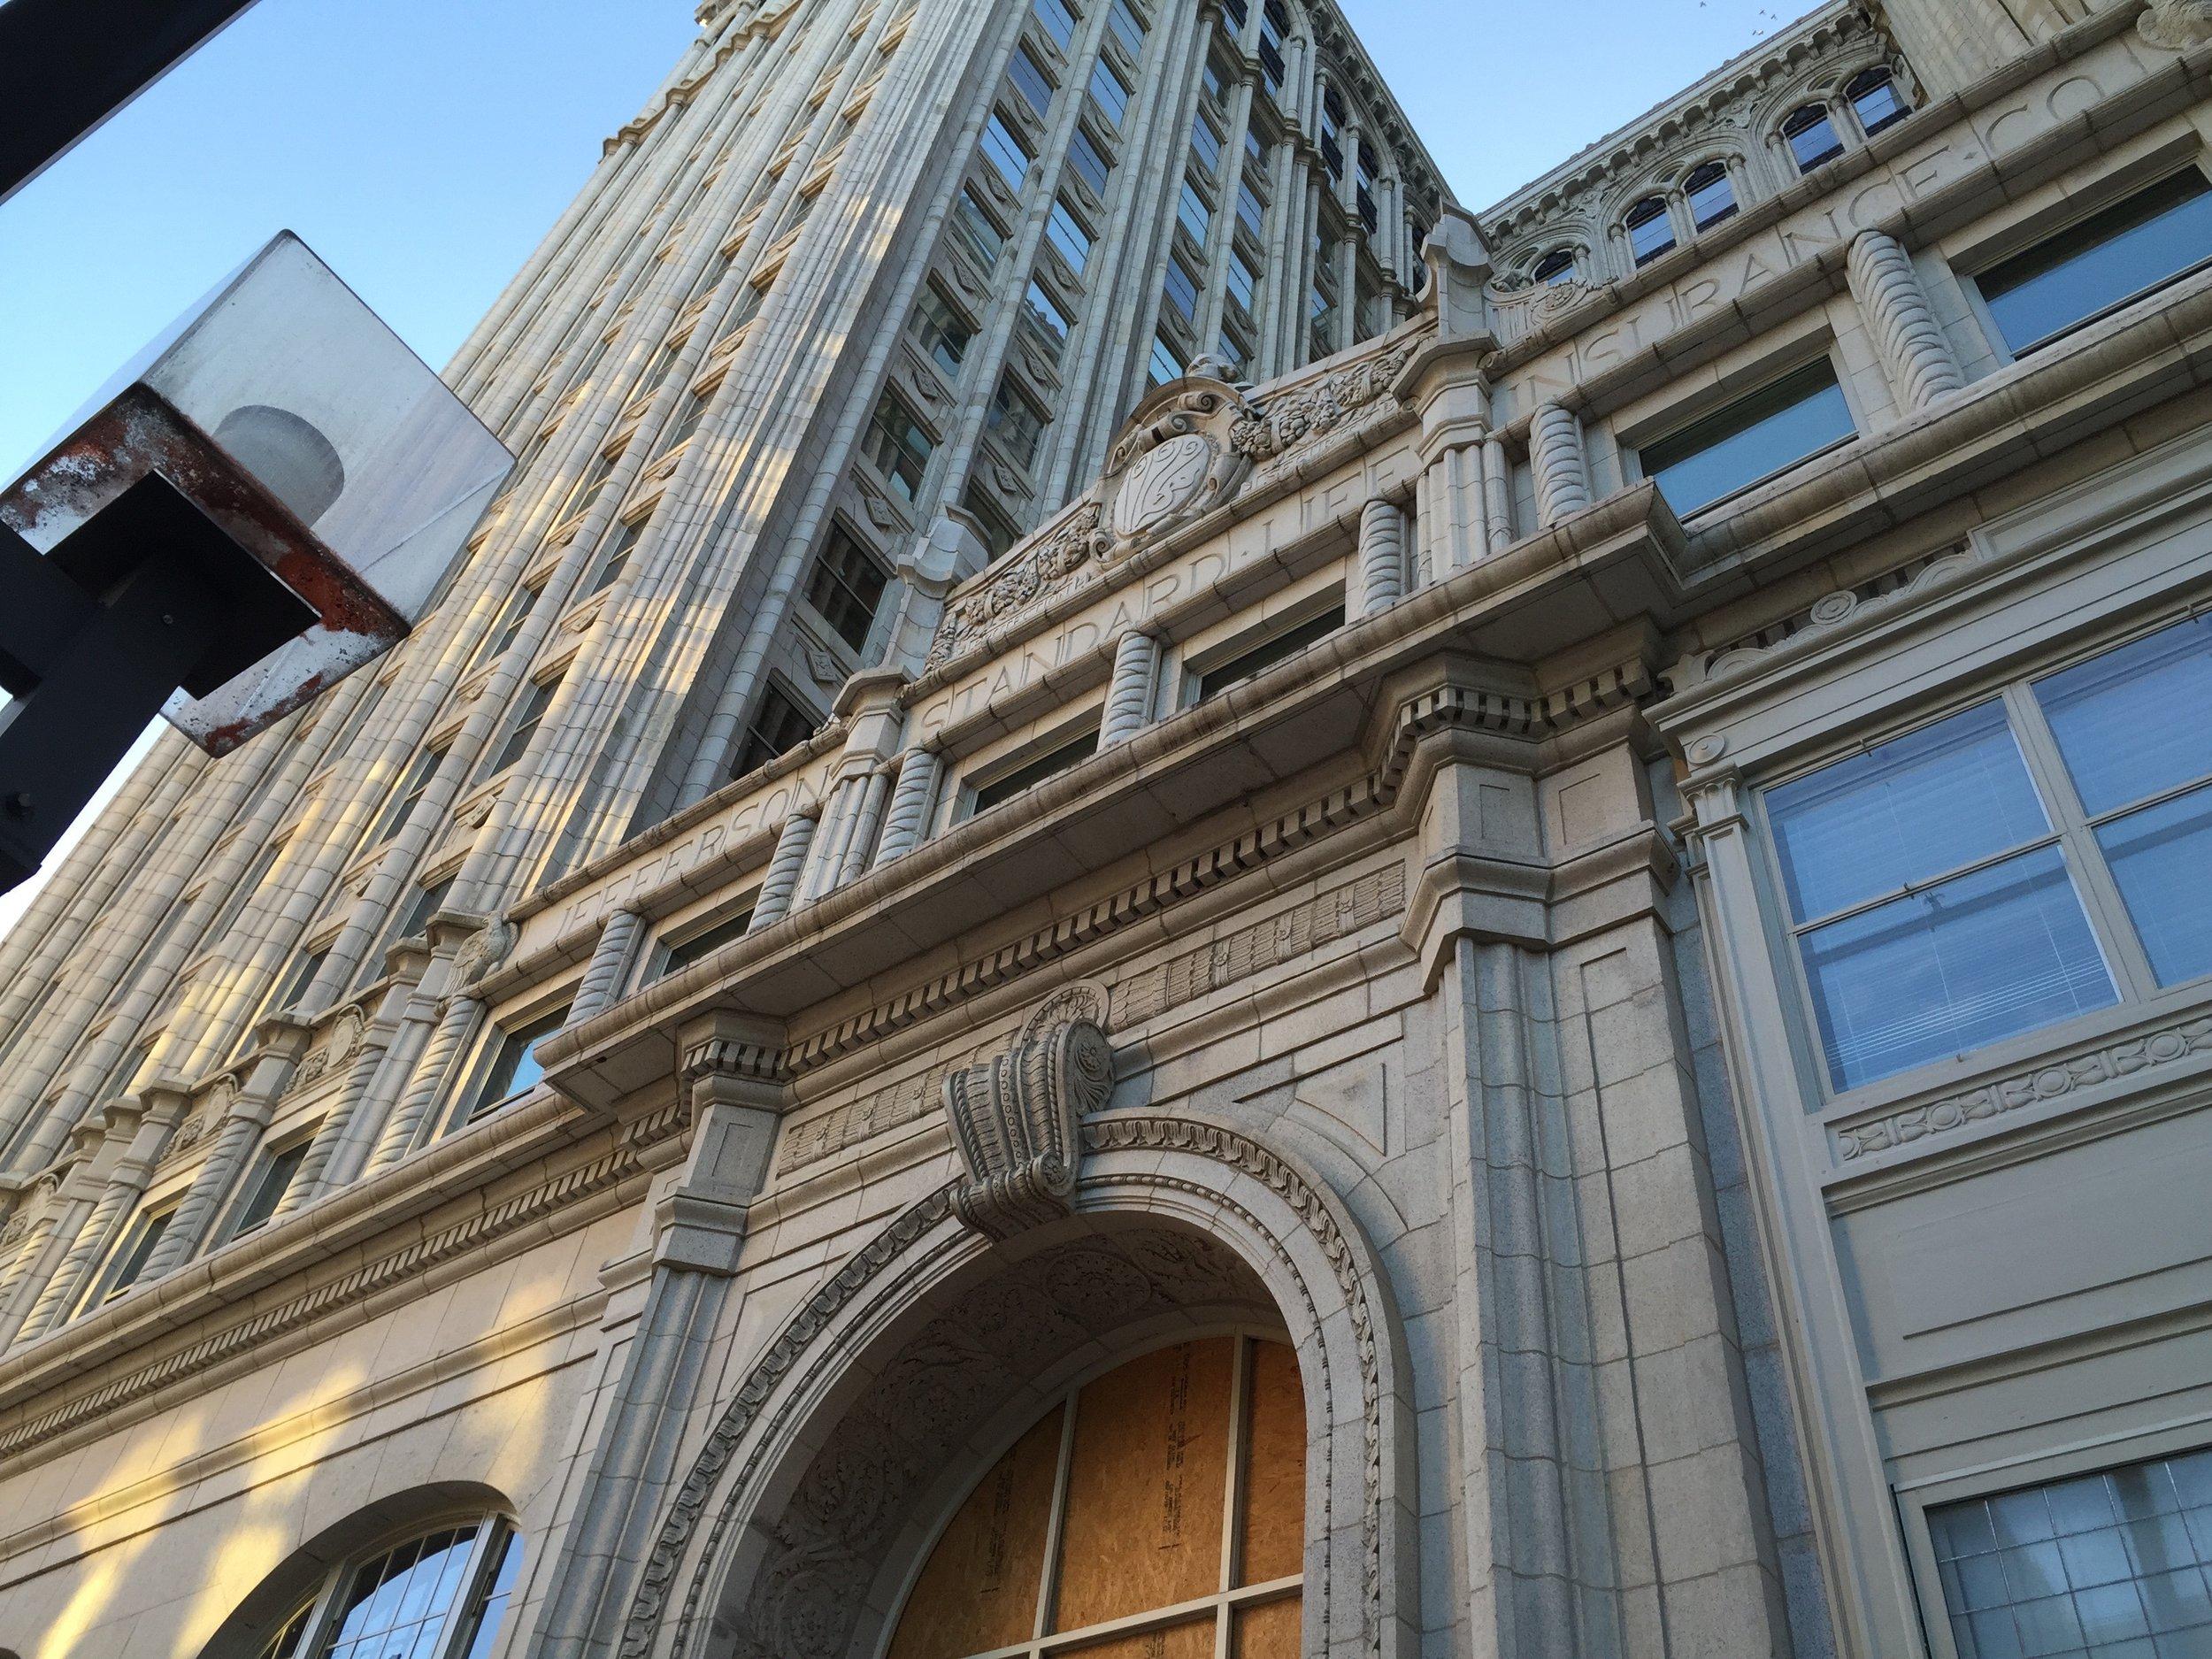 Jefferson Standard Building. Photo I took on a recent artist's date